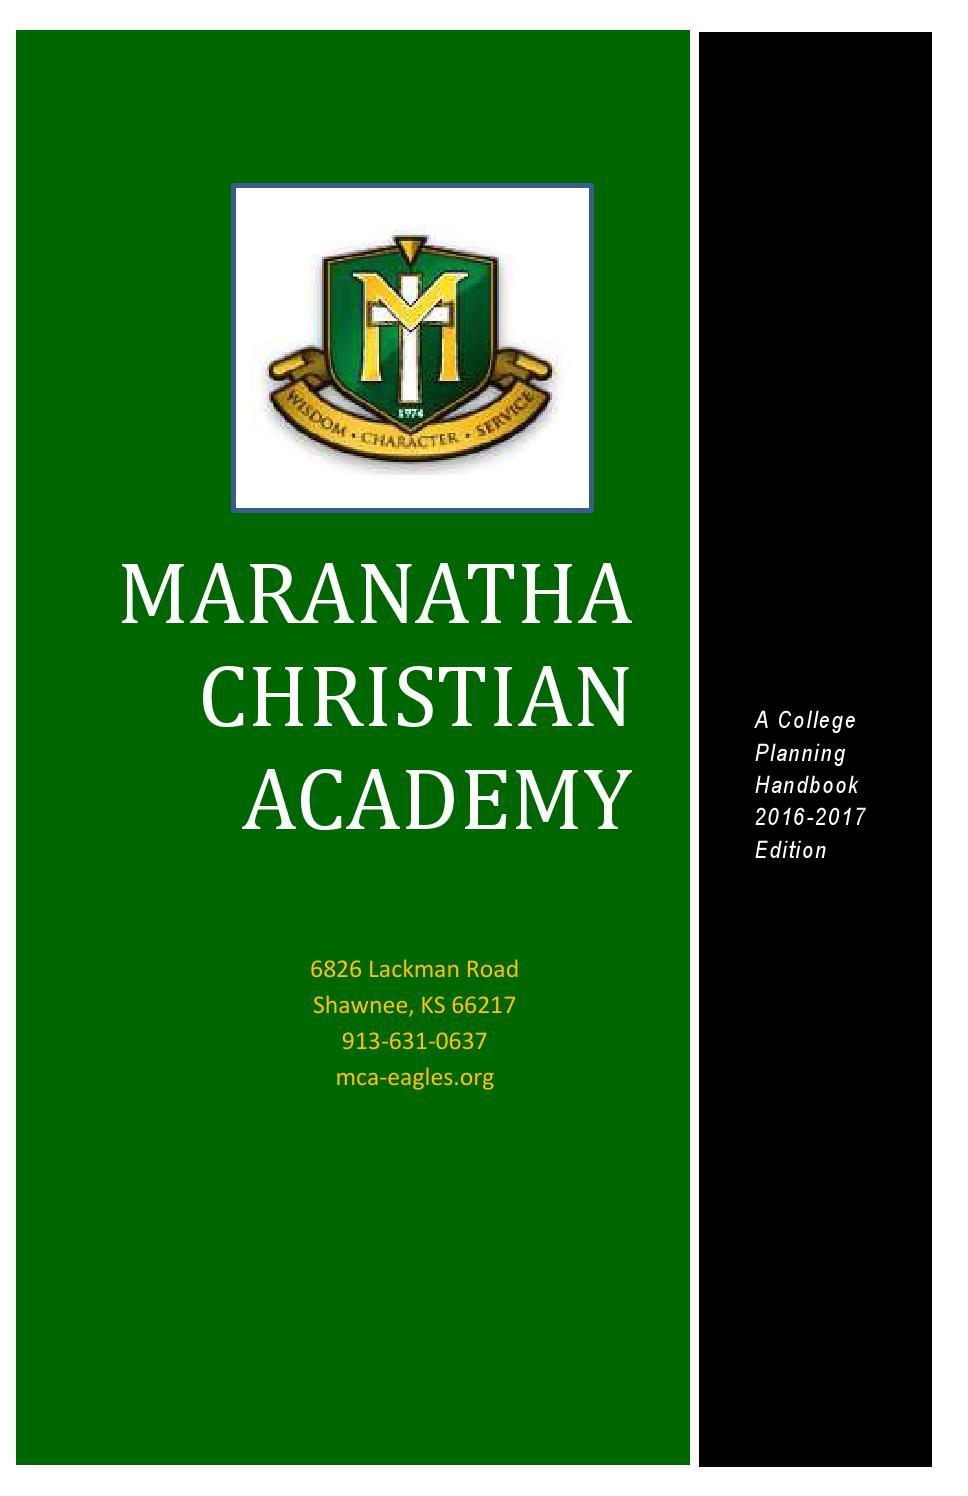 college career center maranatha christian academy of shawnee ks mca college planning handbook